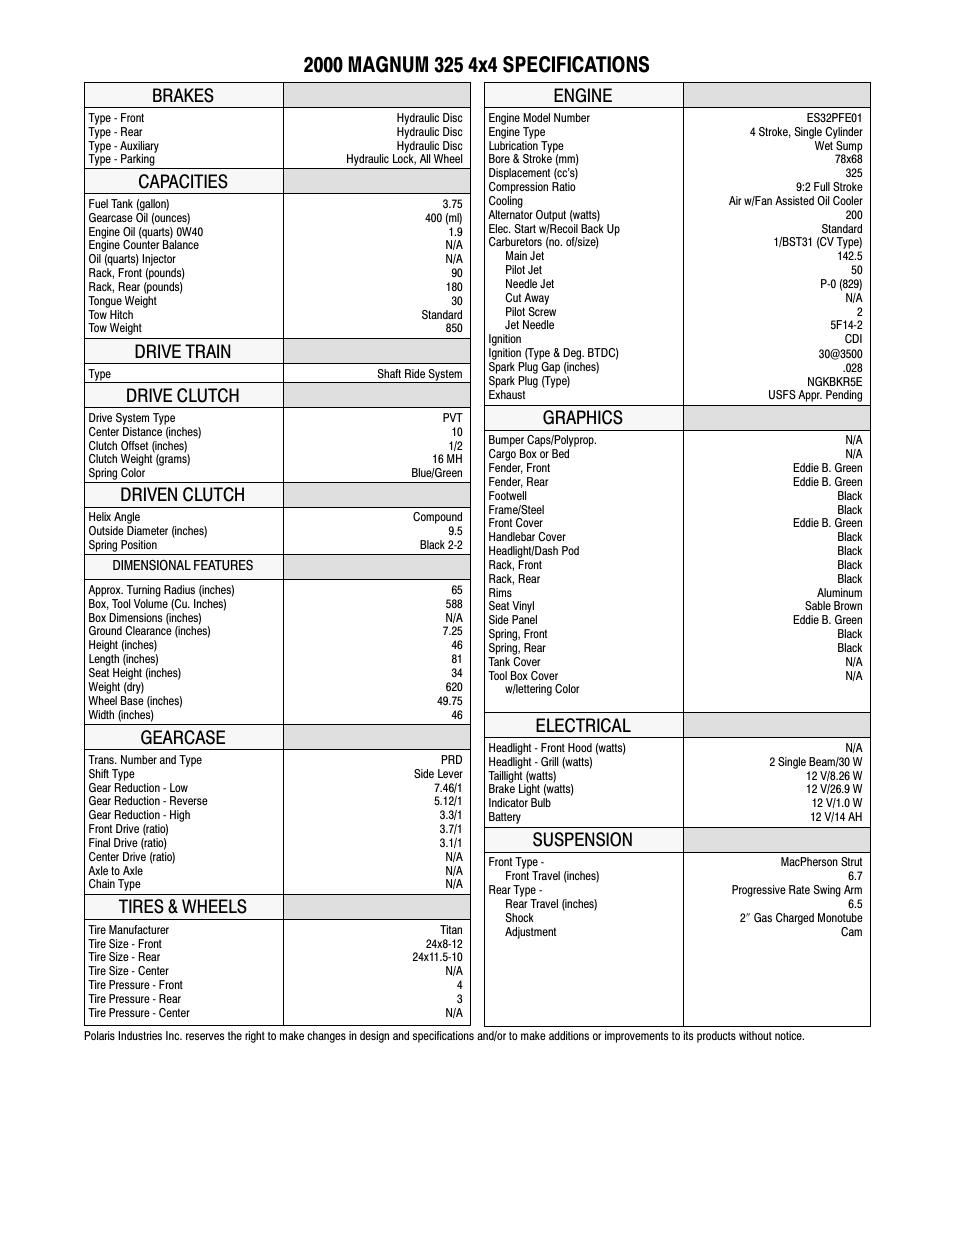 Brakes, Capacities, Drive train | Polaris MAGNUM 325 4X4 A00CD32AA User  Manual | Page 3 / 59